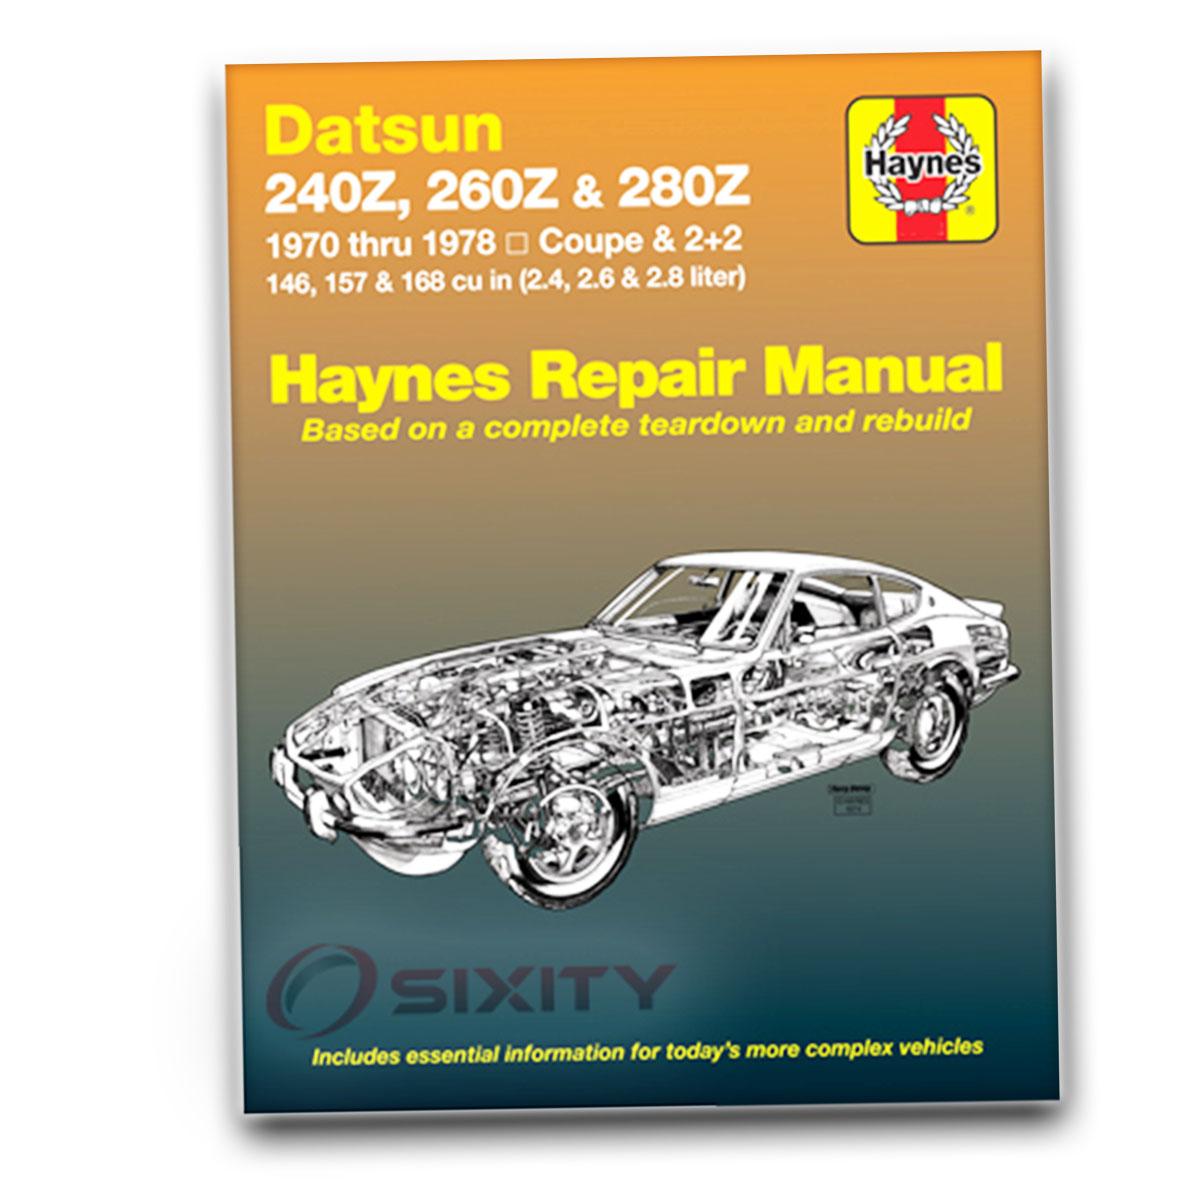 Haynes Repair Manual 28012 For Datsun 240z 260z 280z 70 78 Shop Nissan 280zx Heater Wiring Diagram Service Py